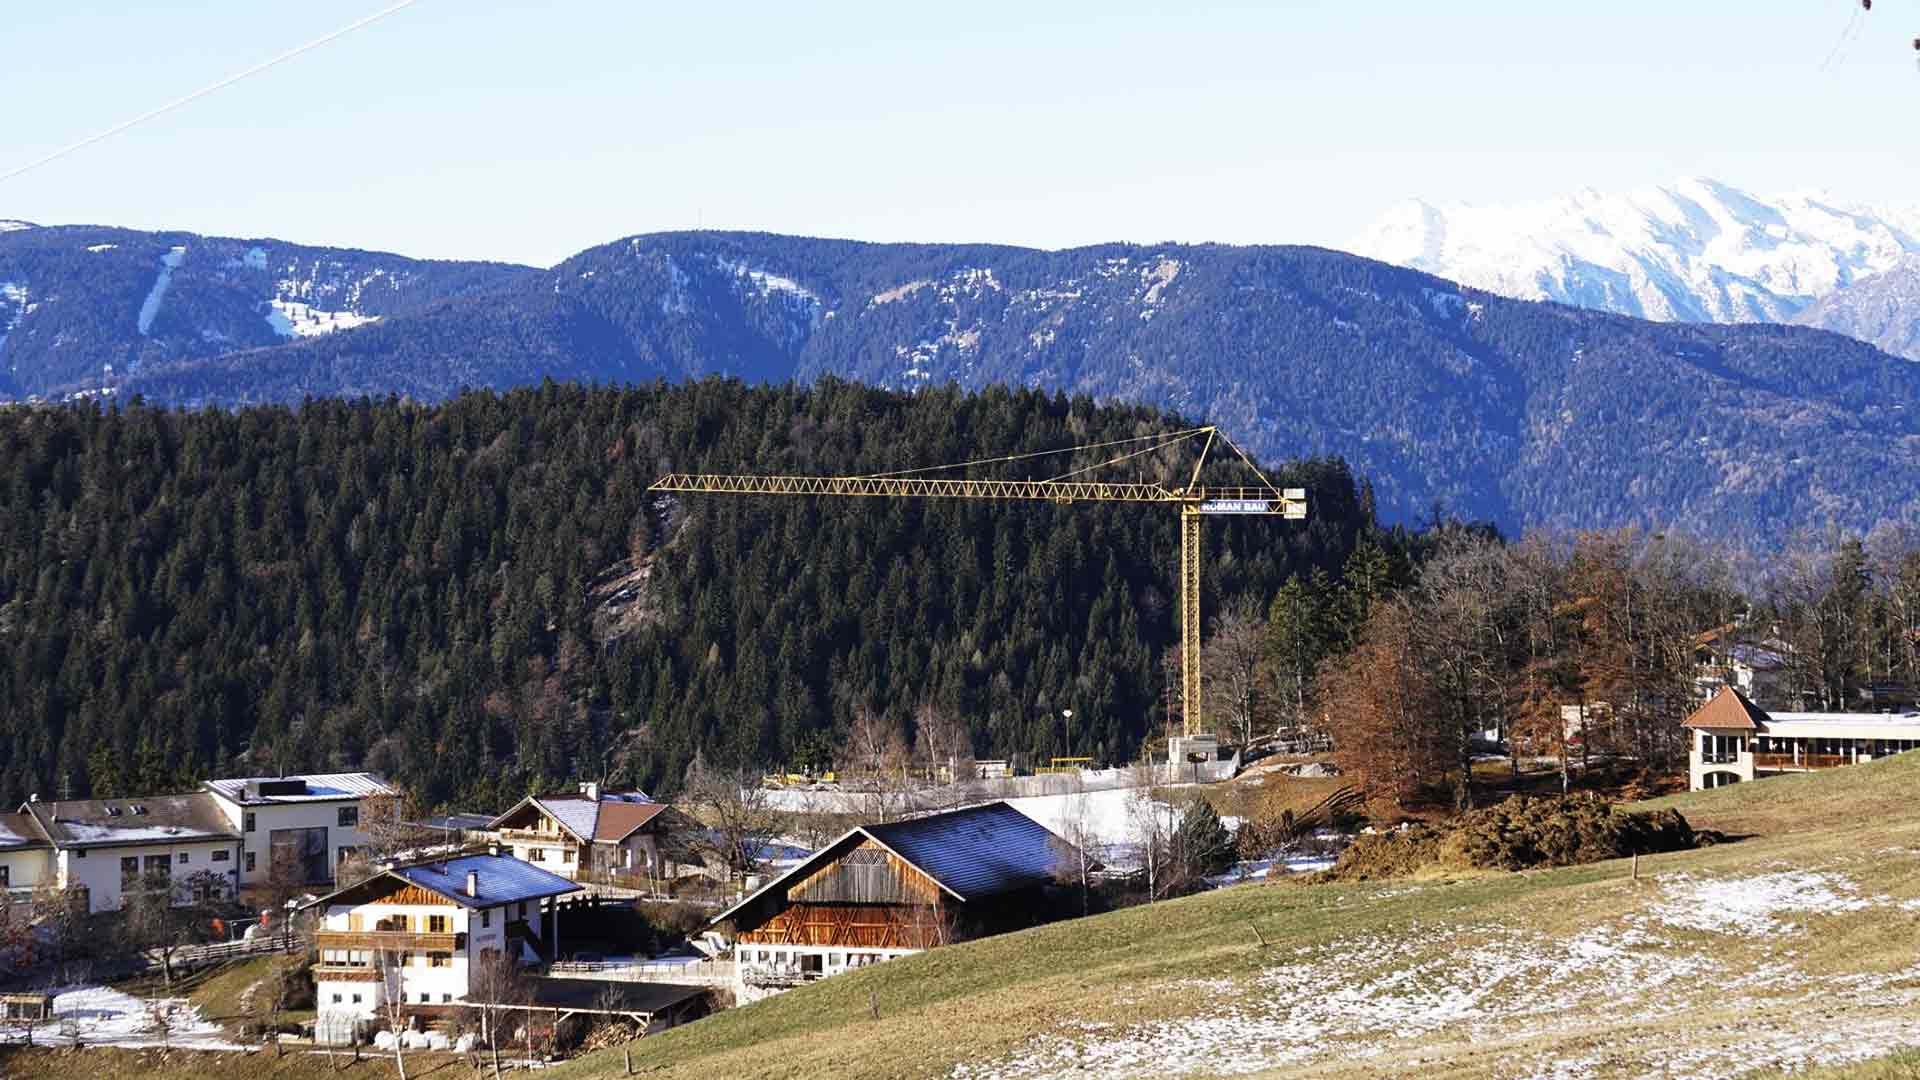 Baustelle-2